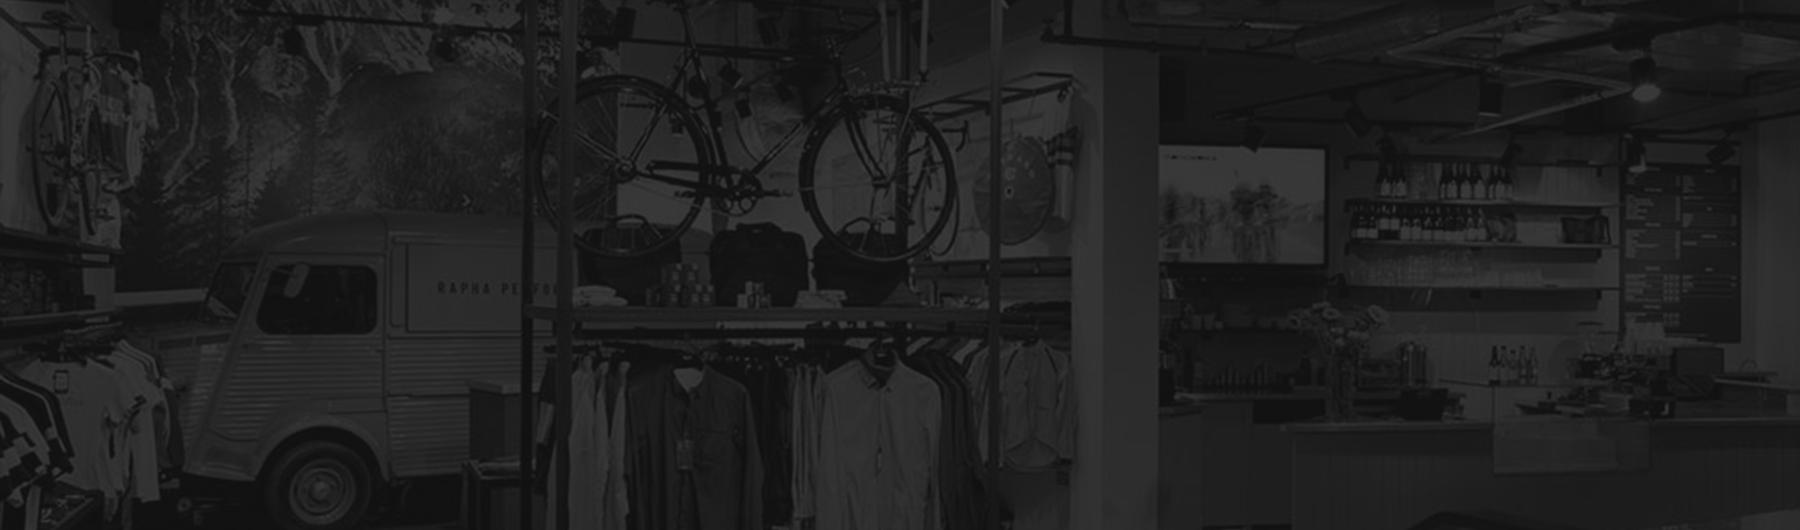 Sunday Workshop - Get your bike season ready